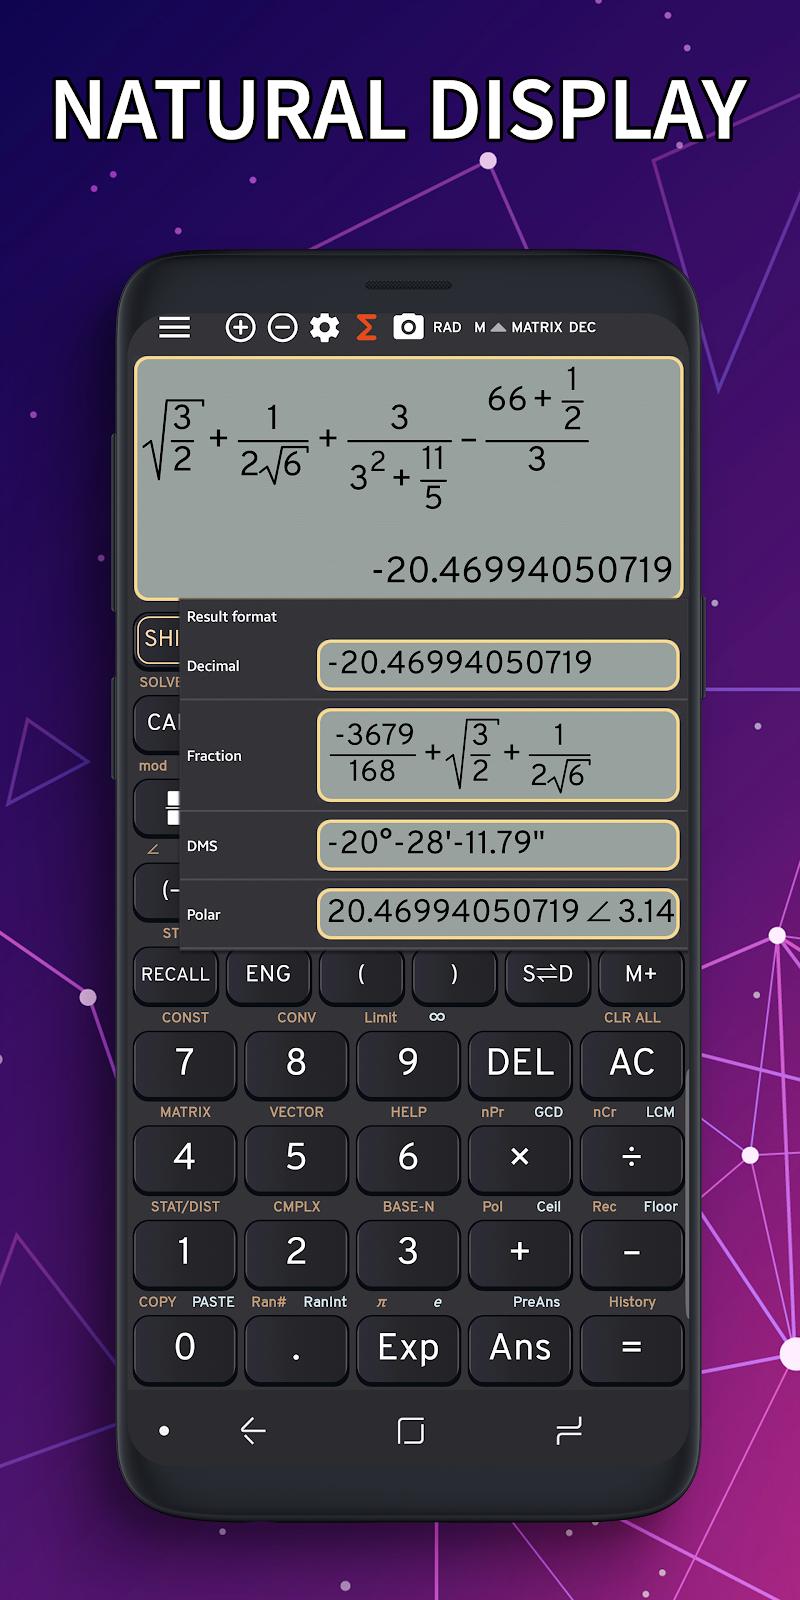 Math Camera FX Calculator 991 ES Emulator 991 EX v3.9.7-beta [Premium]